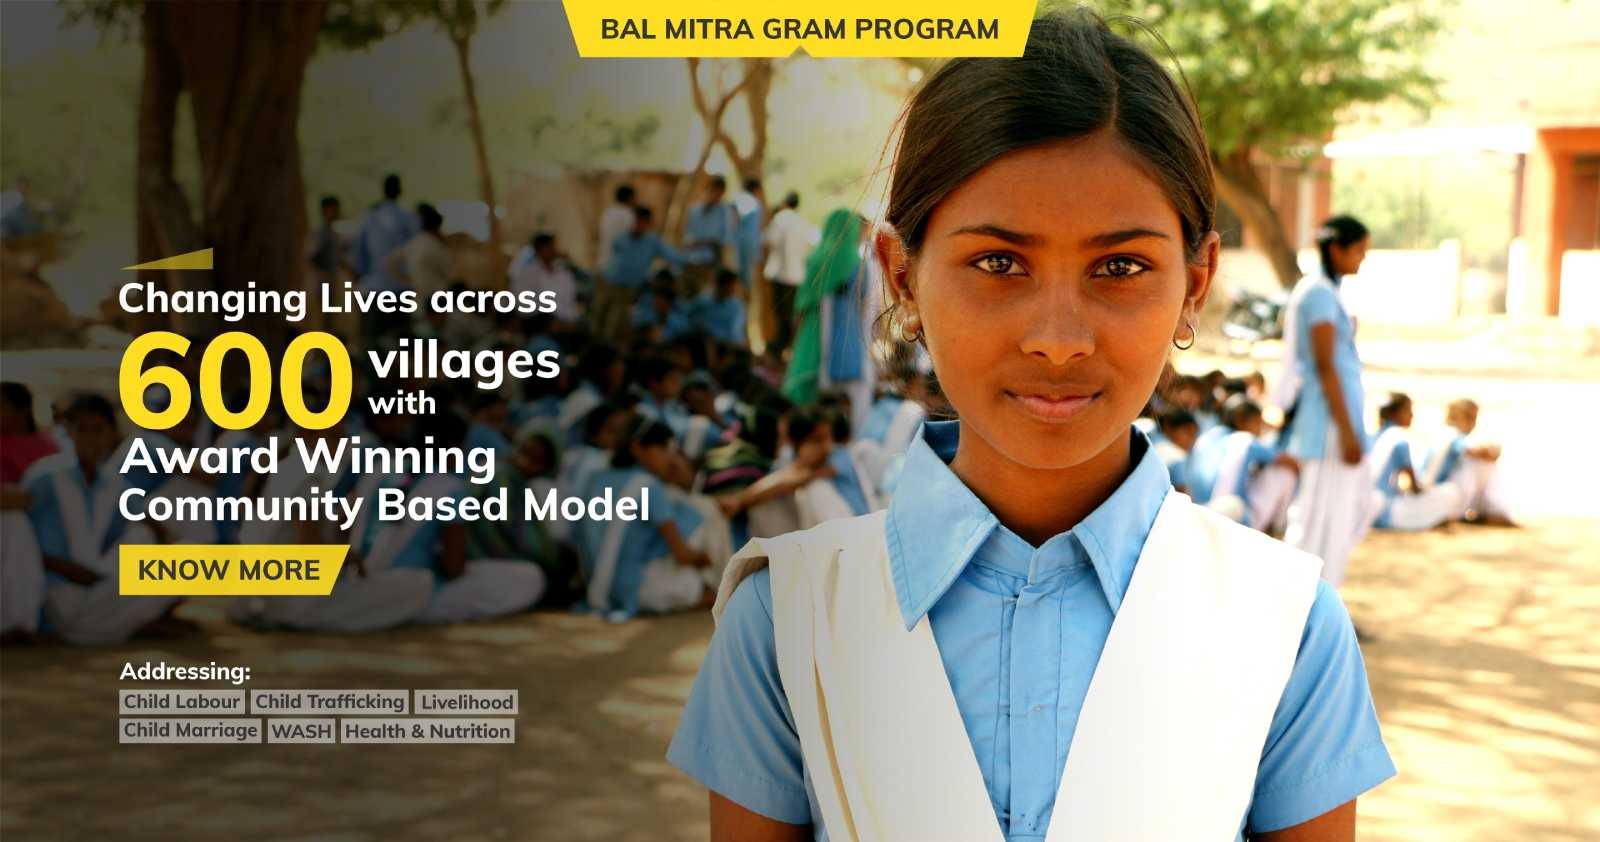 Bal Mitra Gram Program